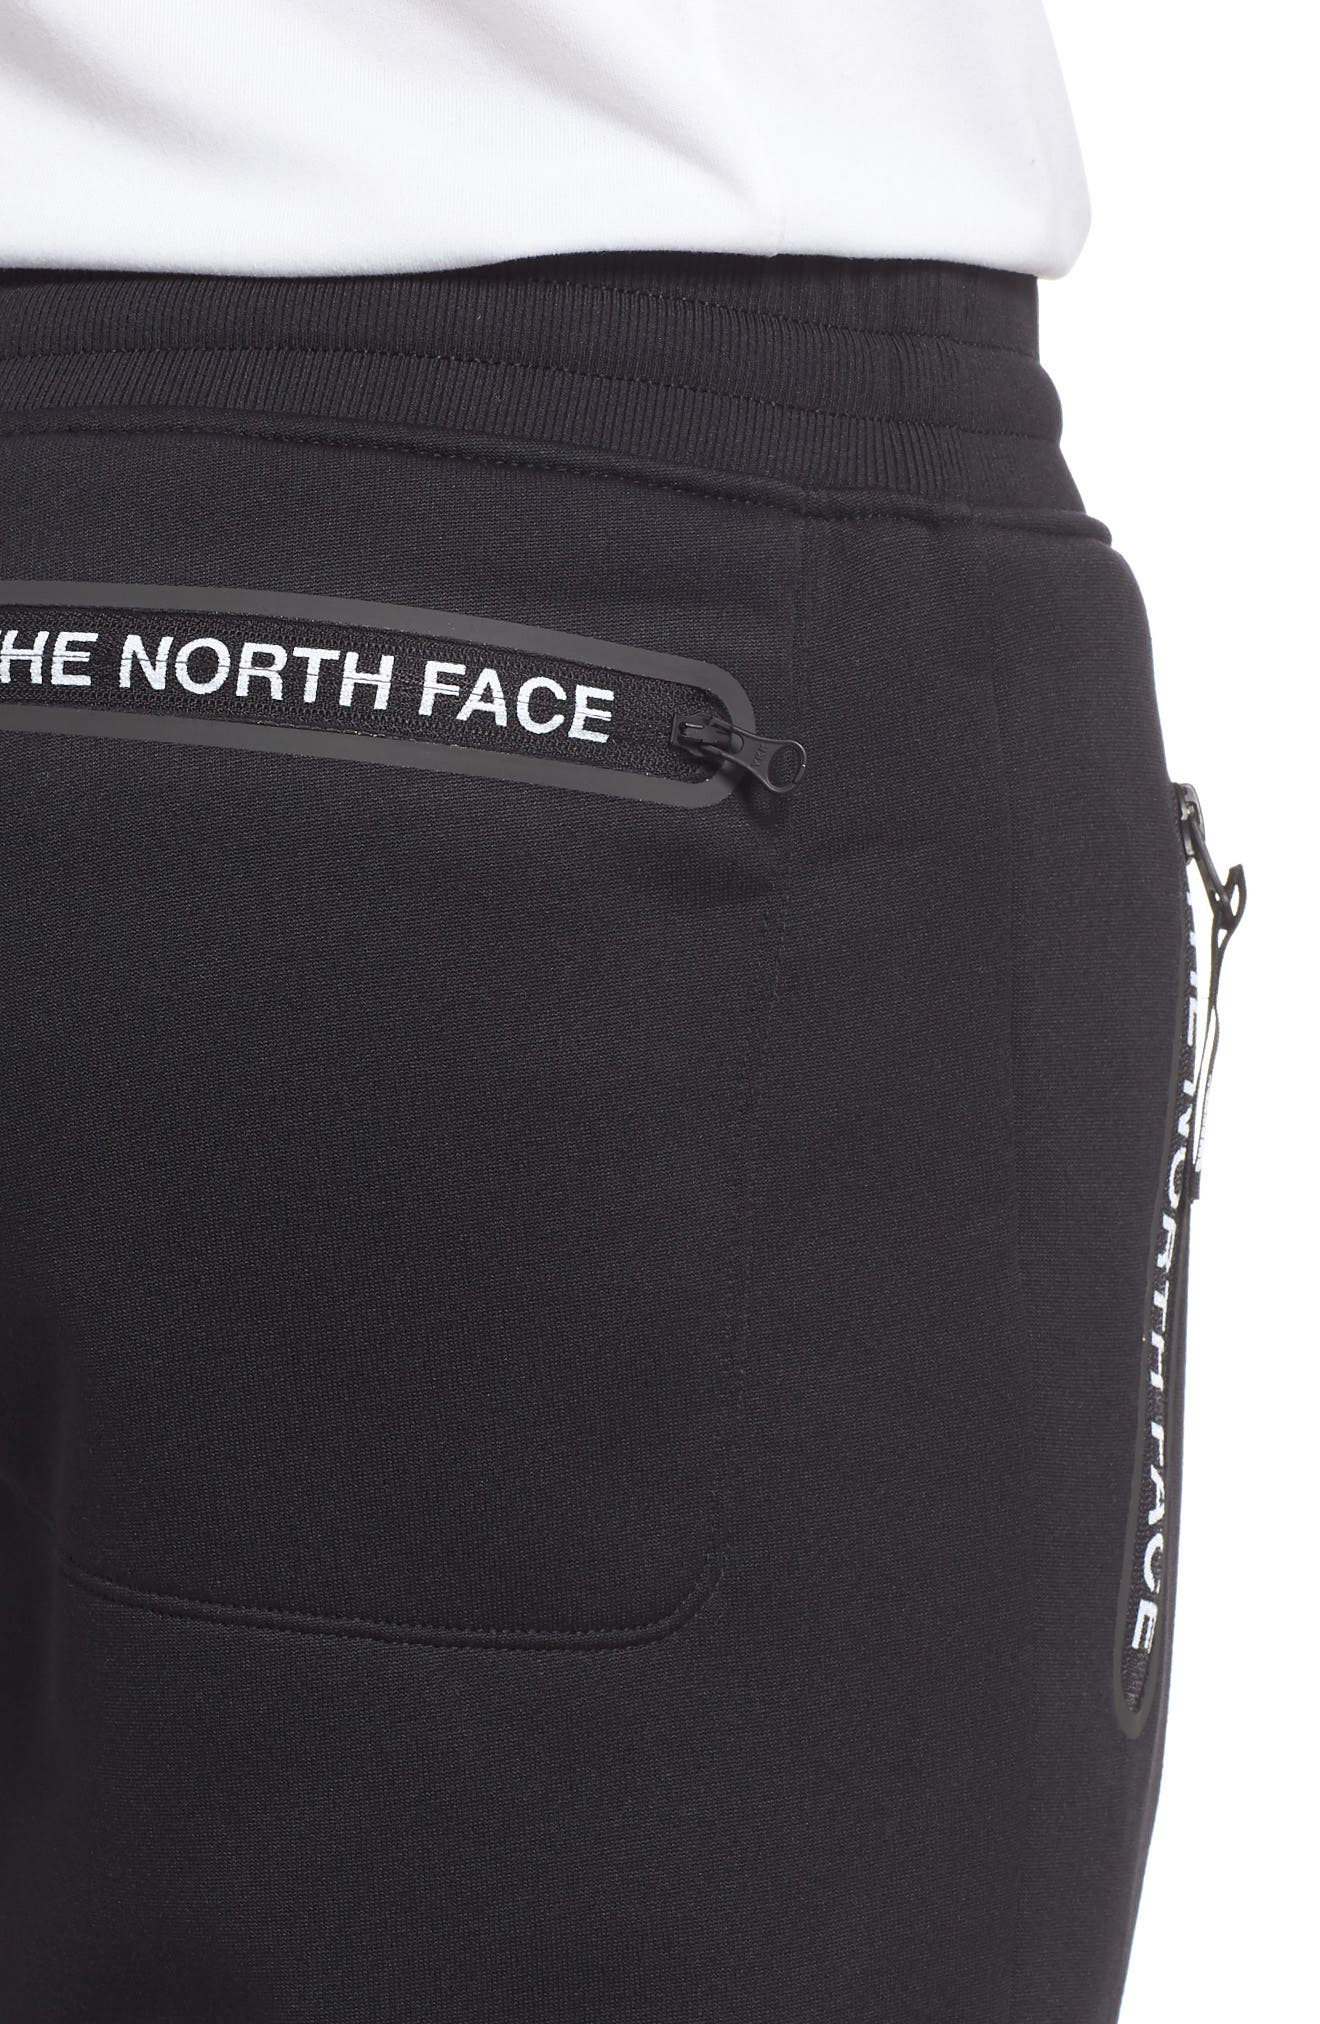 Mount Modern Jogger Pants,                             Alternate thumbnail 4, color,                             Tnf Black